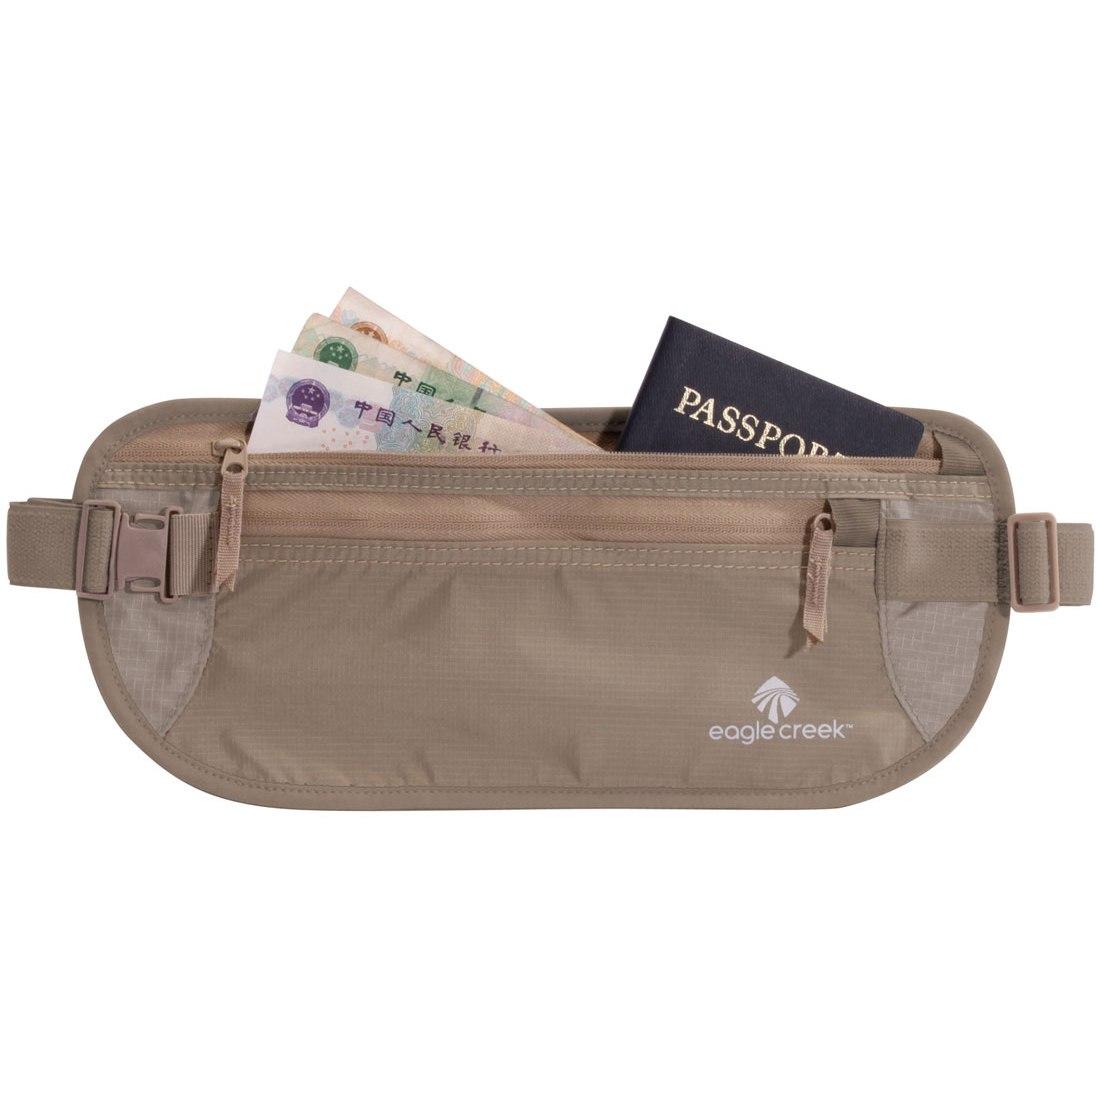 Image of Eagle Creek Undercover Money Belt DLX Wallet - khaki